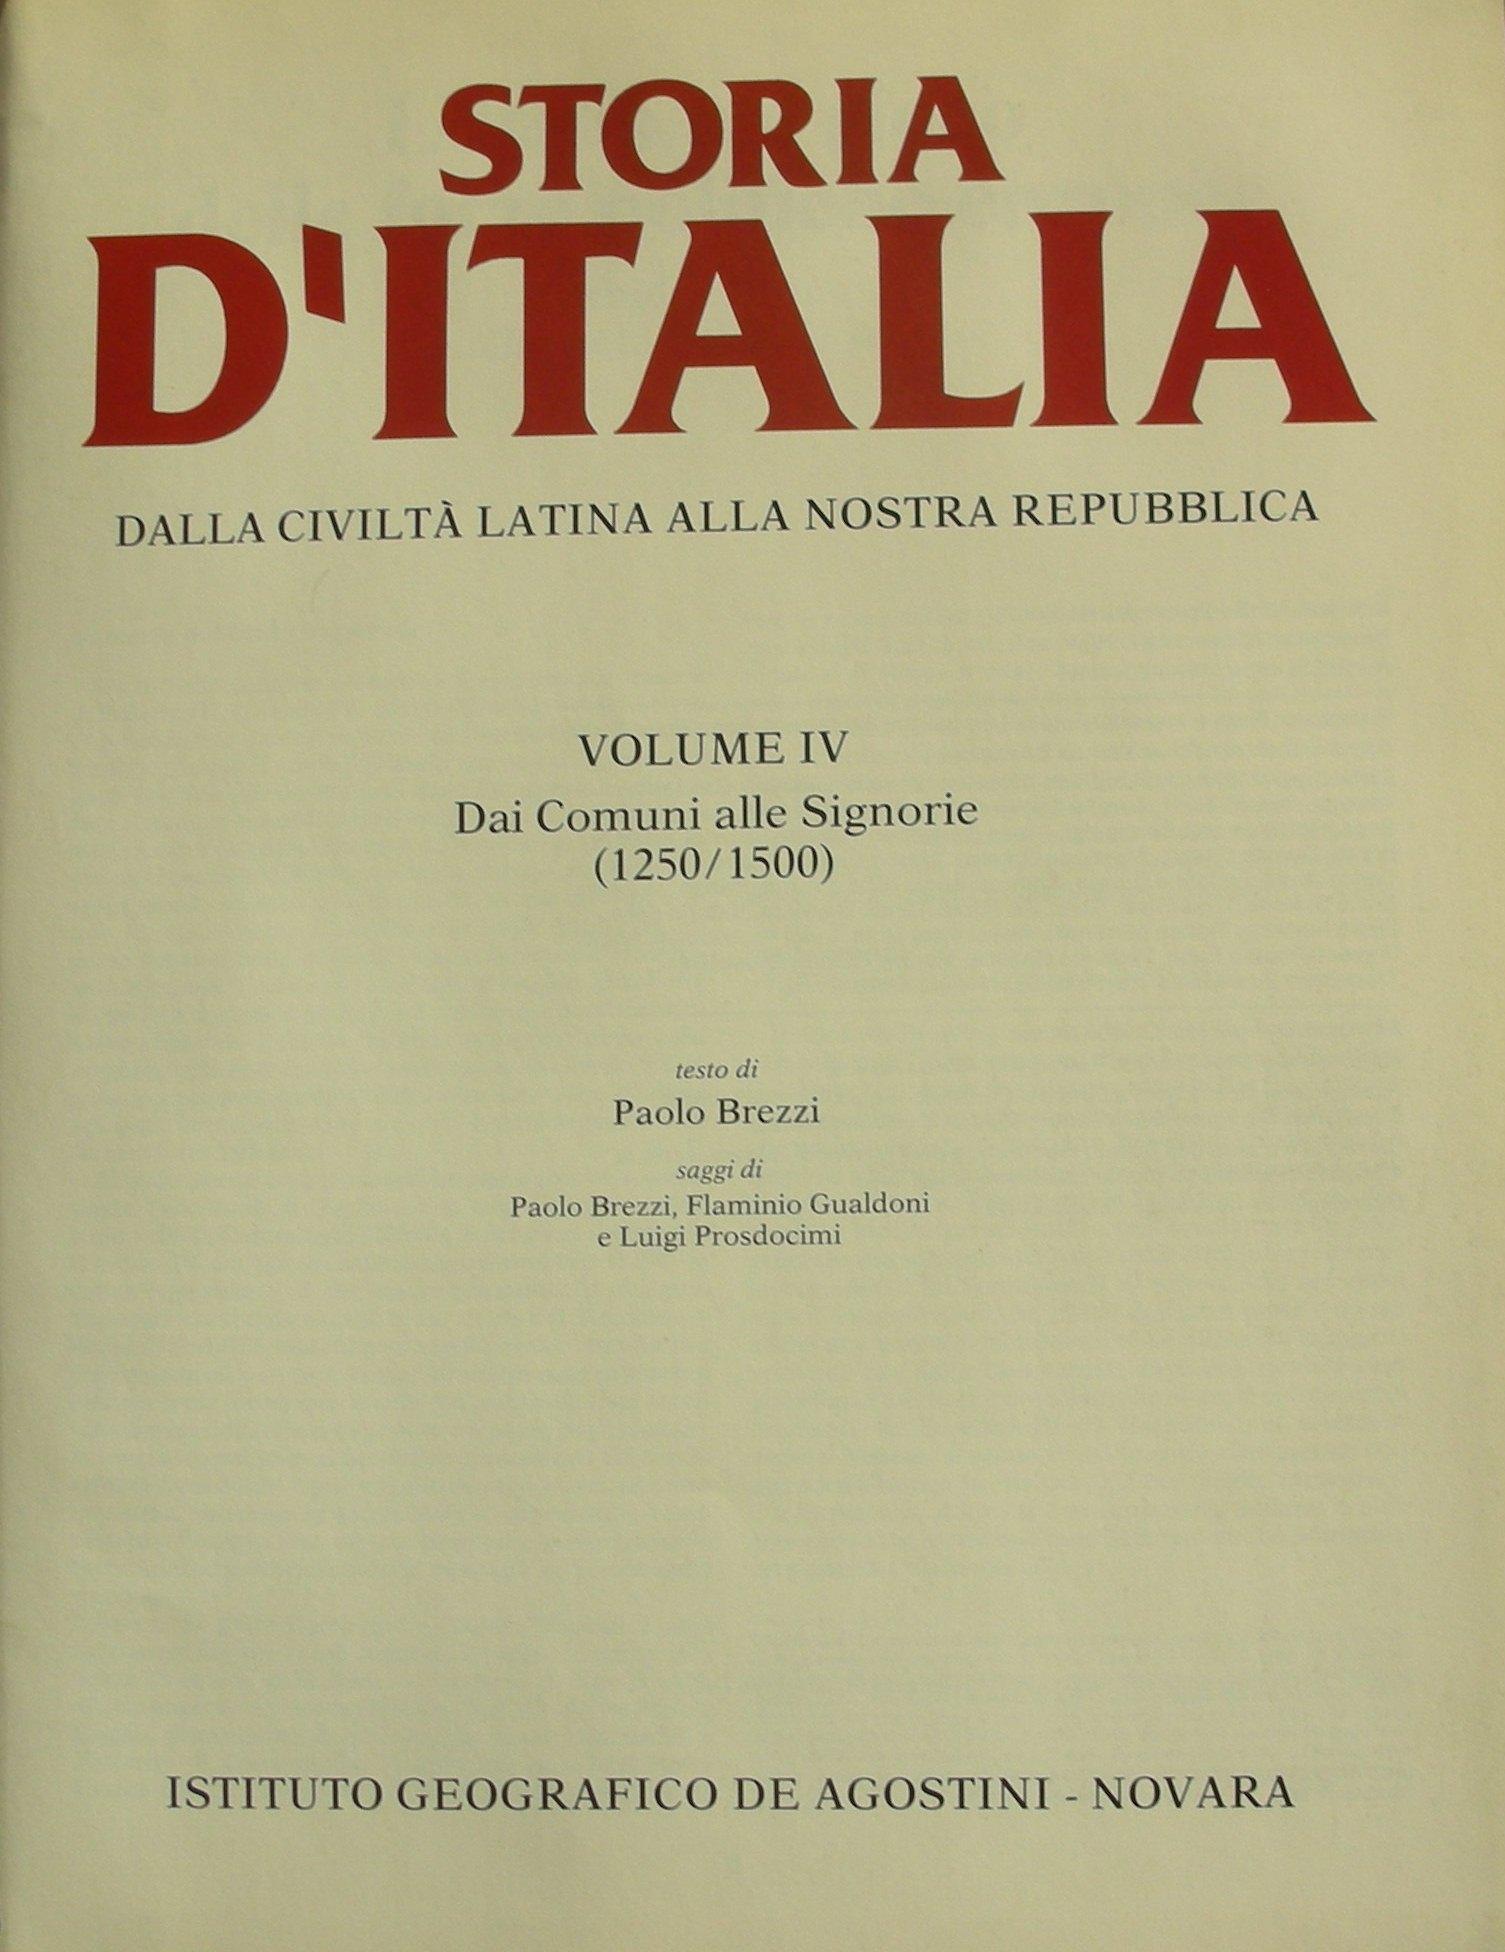 Storia d'Italia vol. IV